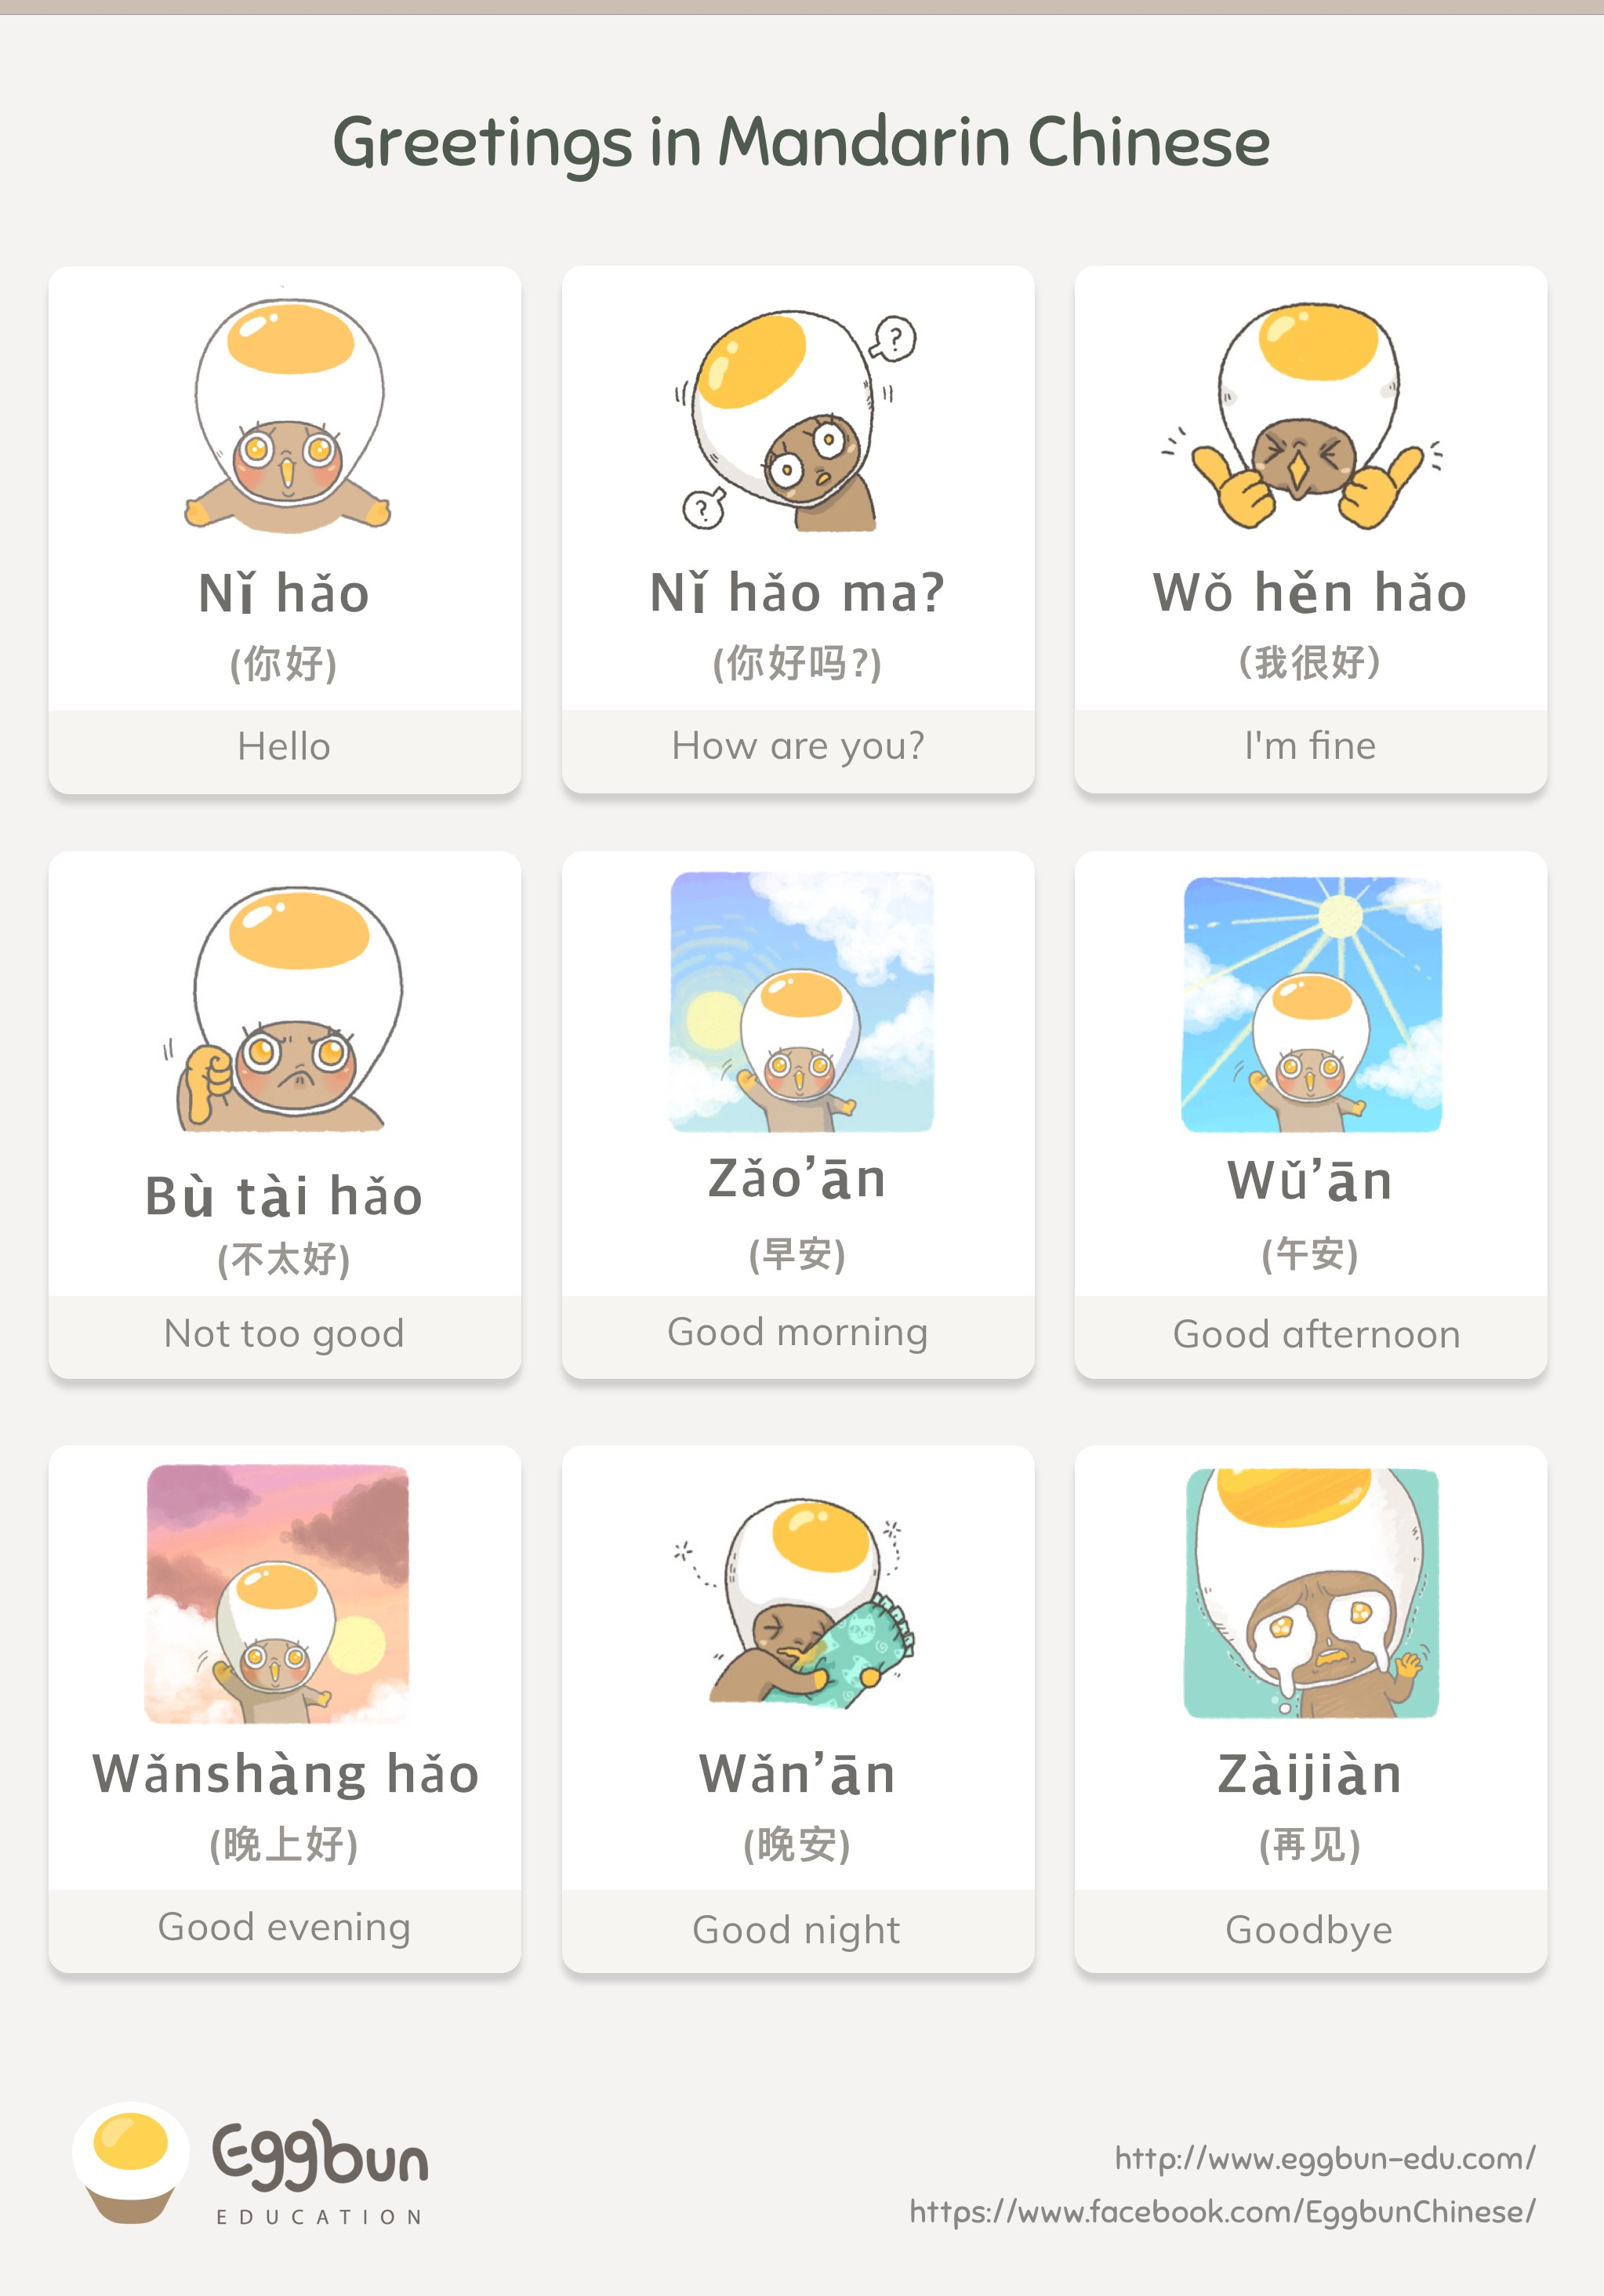 Basic Greetings In Mandarin Chinese